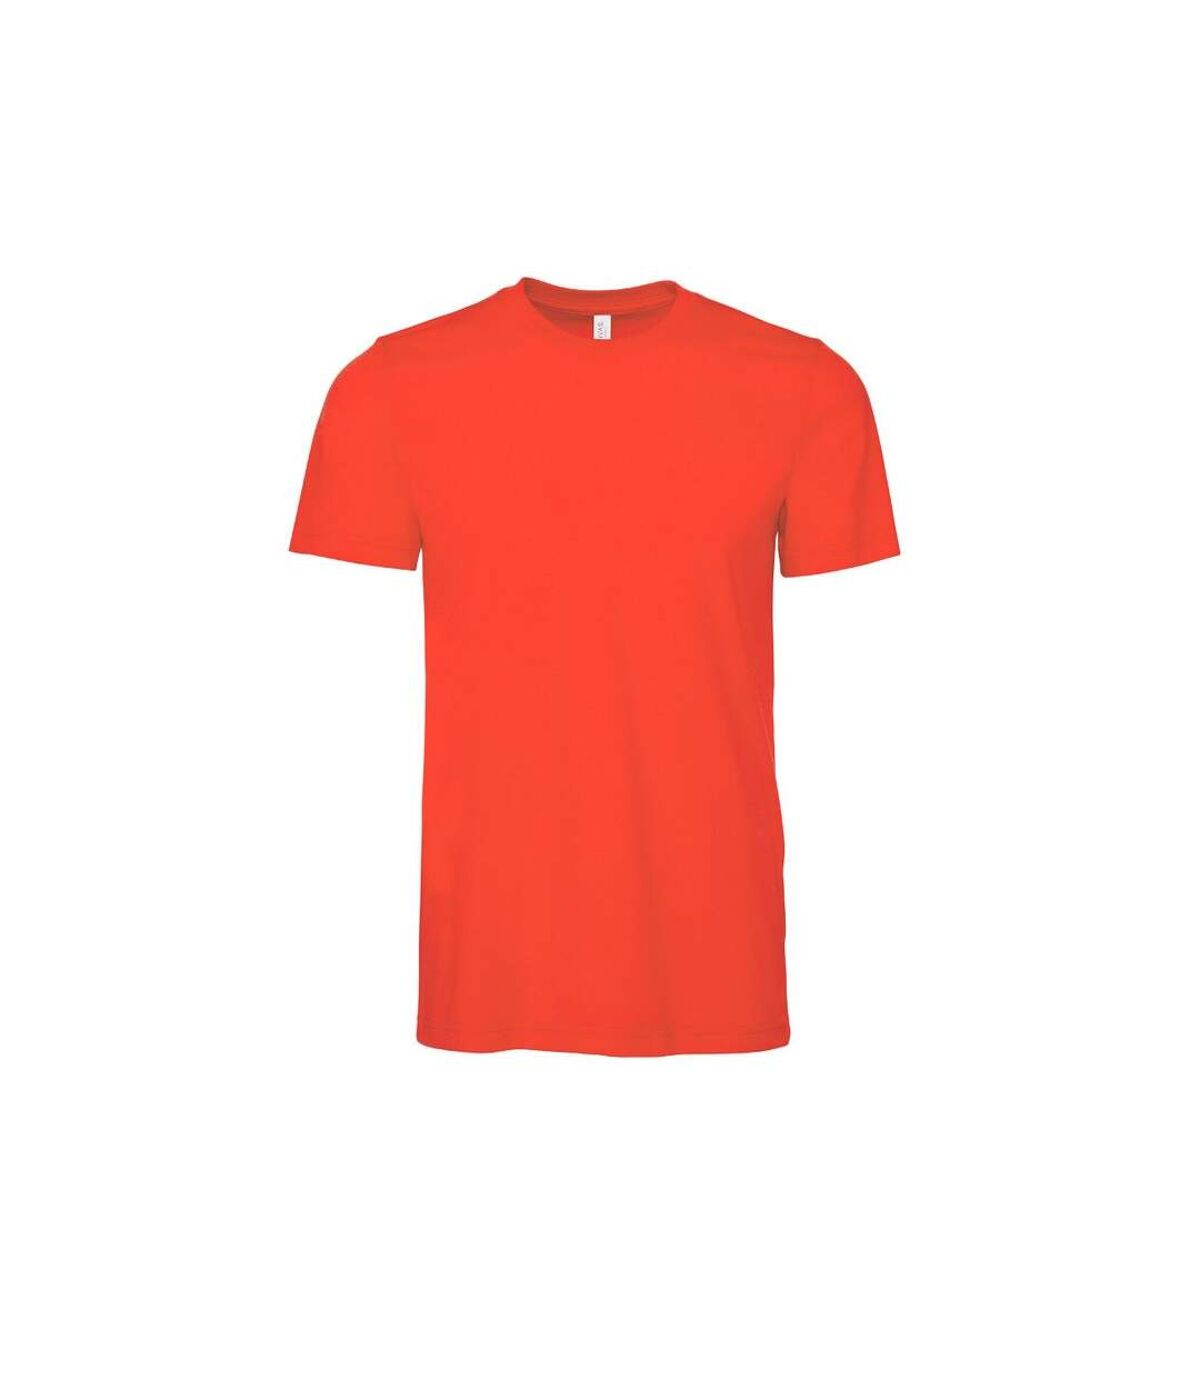 Canvas Unisex Jersey Crew Neck T-Shirt / Mens Short Sleeve T-Shirt (Poppy) - UTBC163